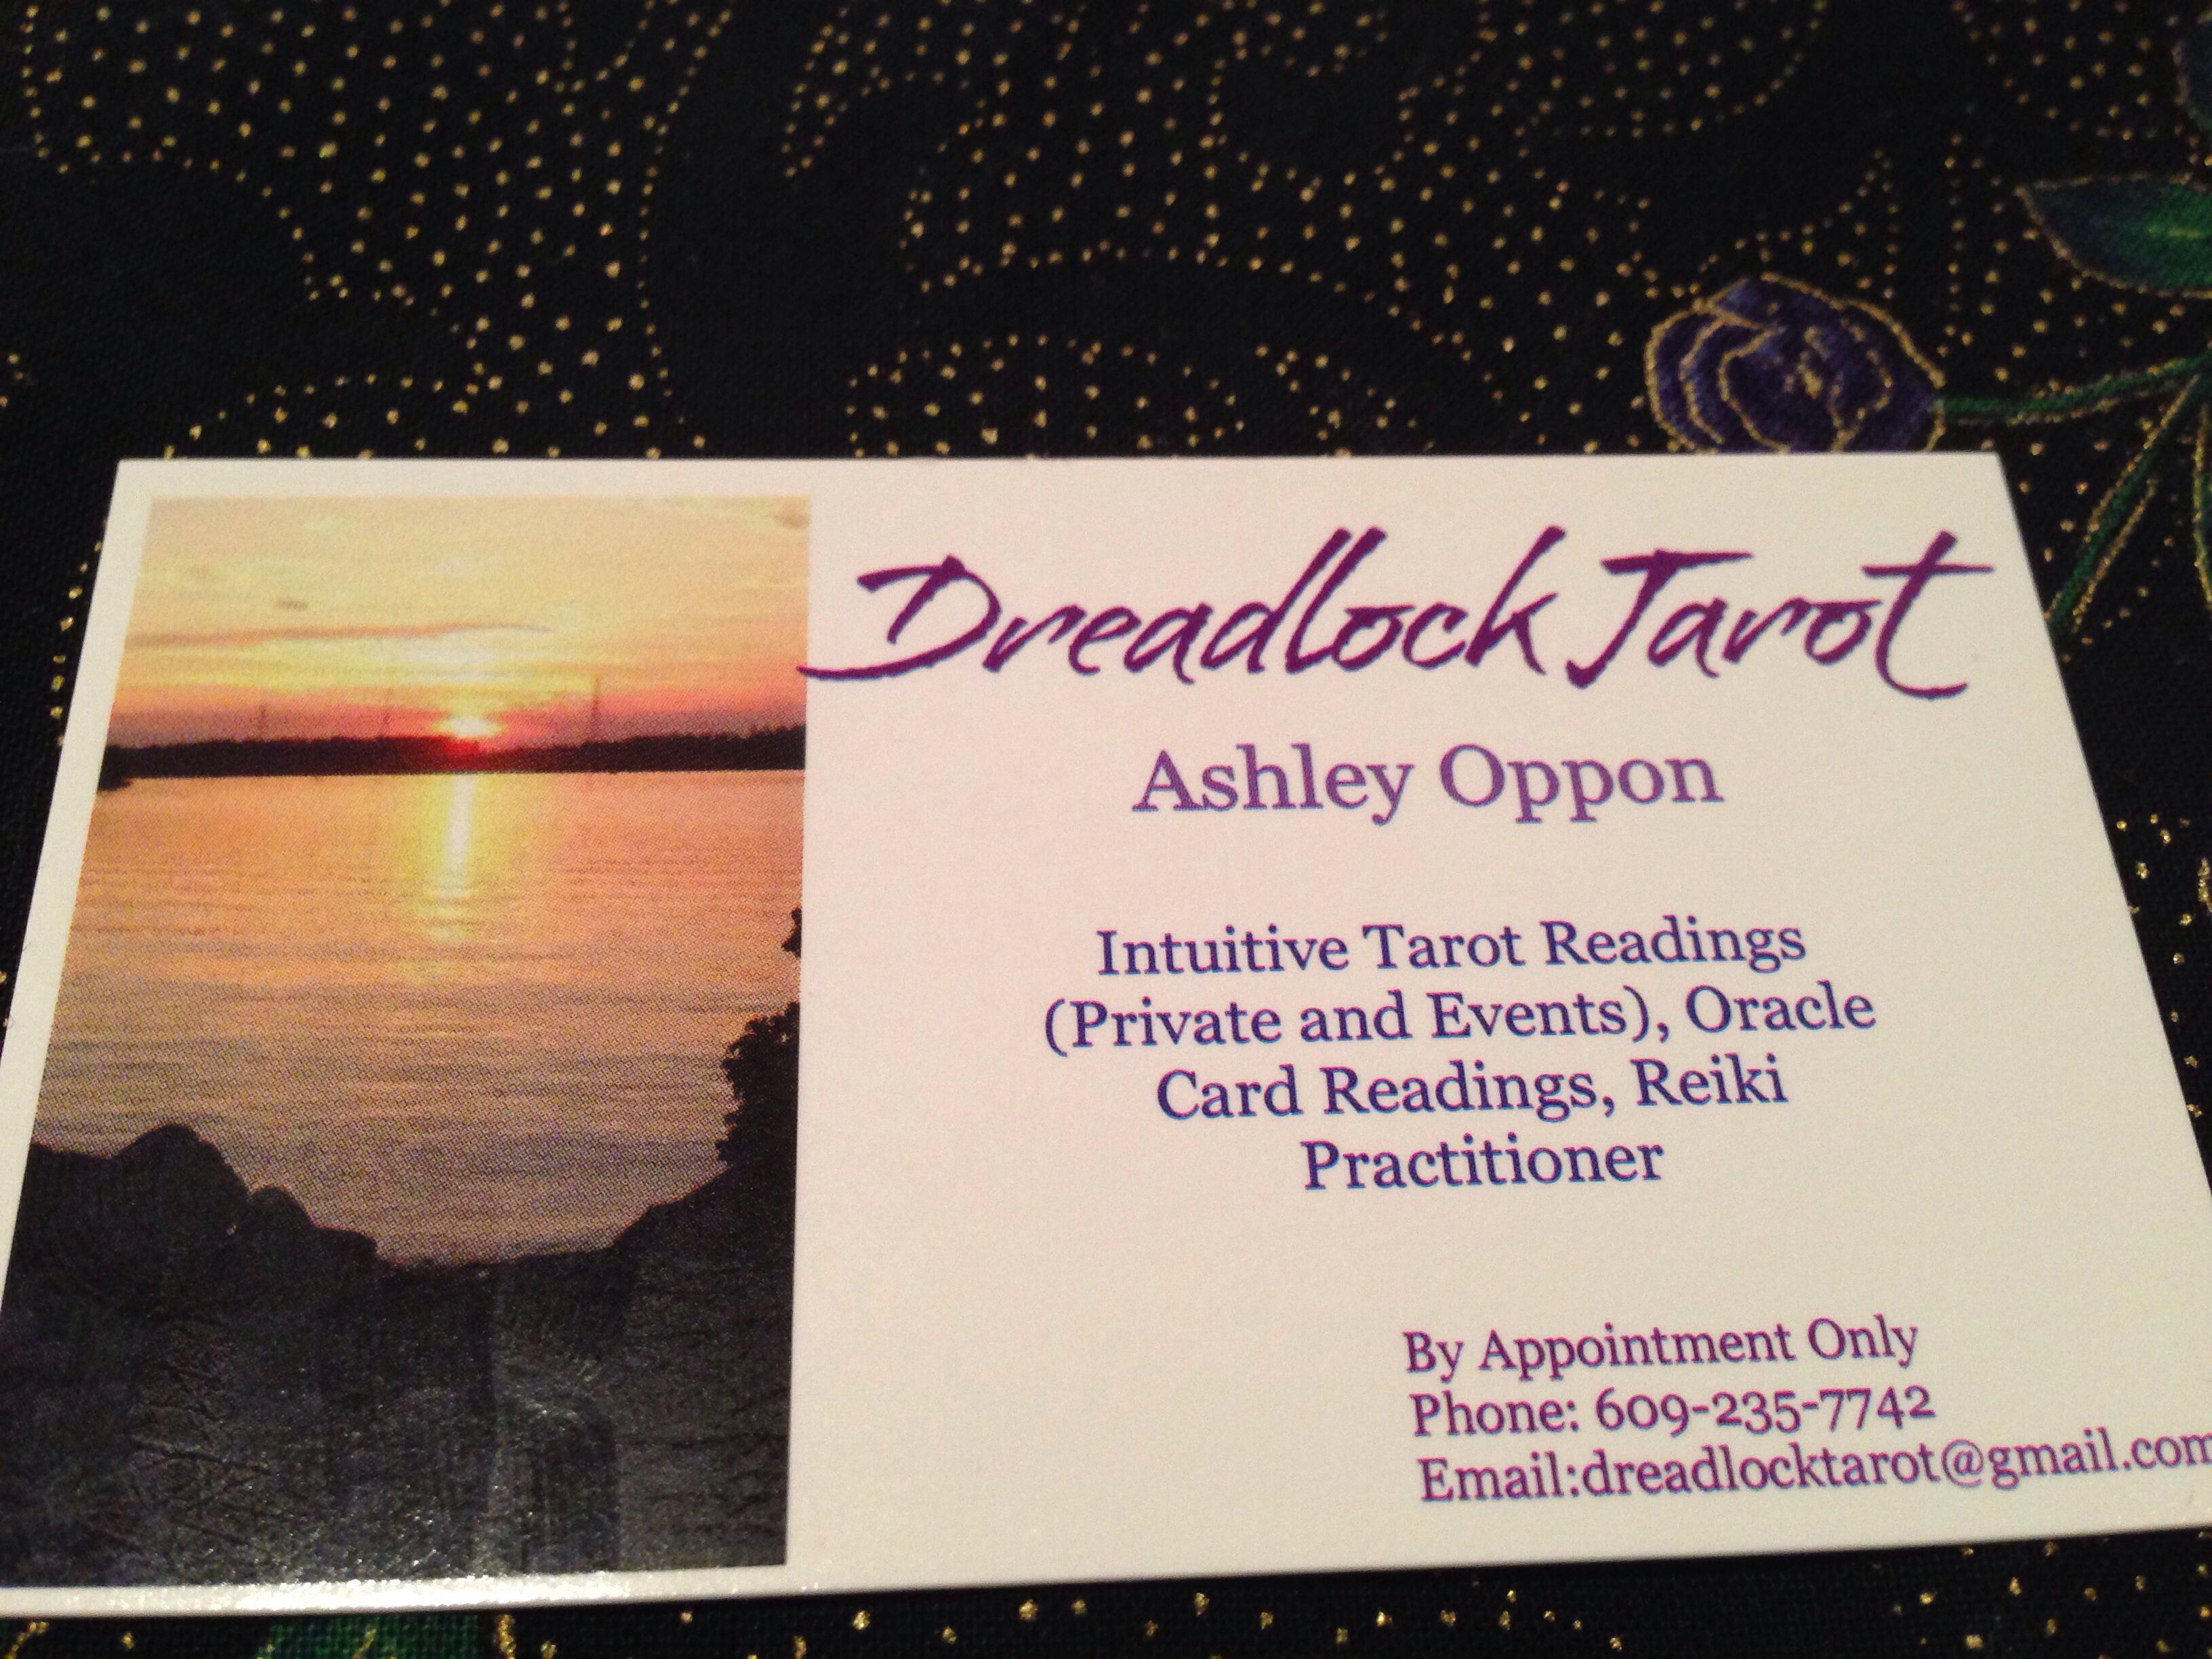 Business Card – Dreadlock Tarot